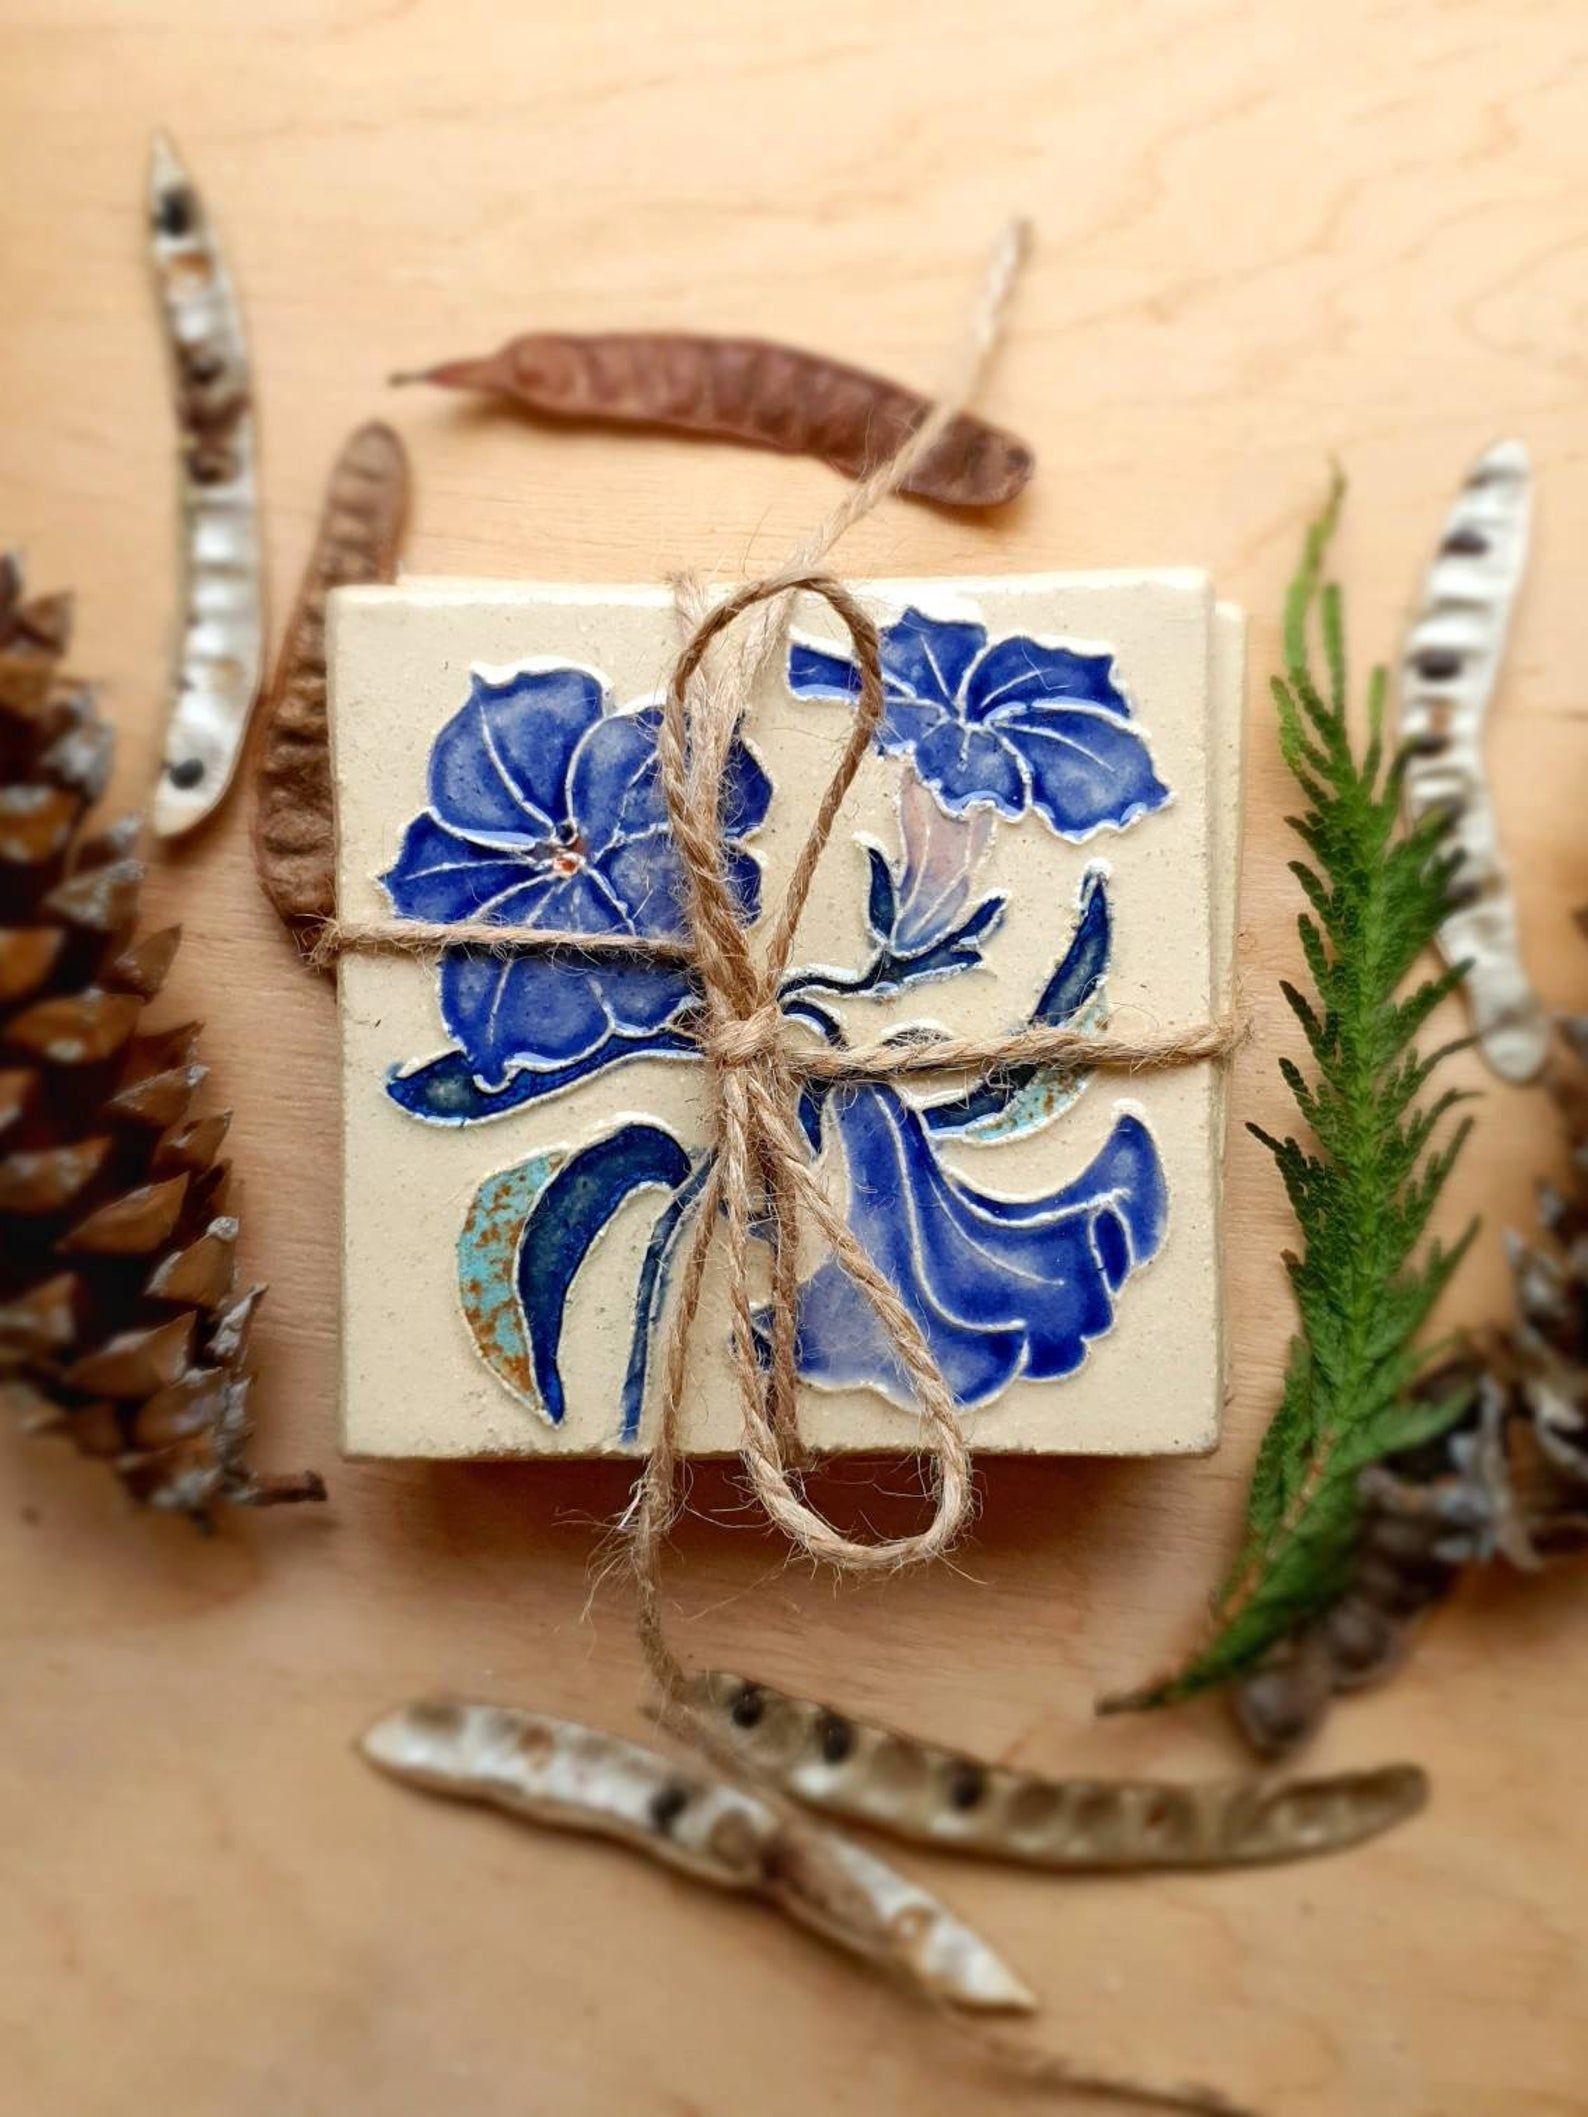 Floral Ceramic Tiles / Set of 4 / Wall Decor / Flower